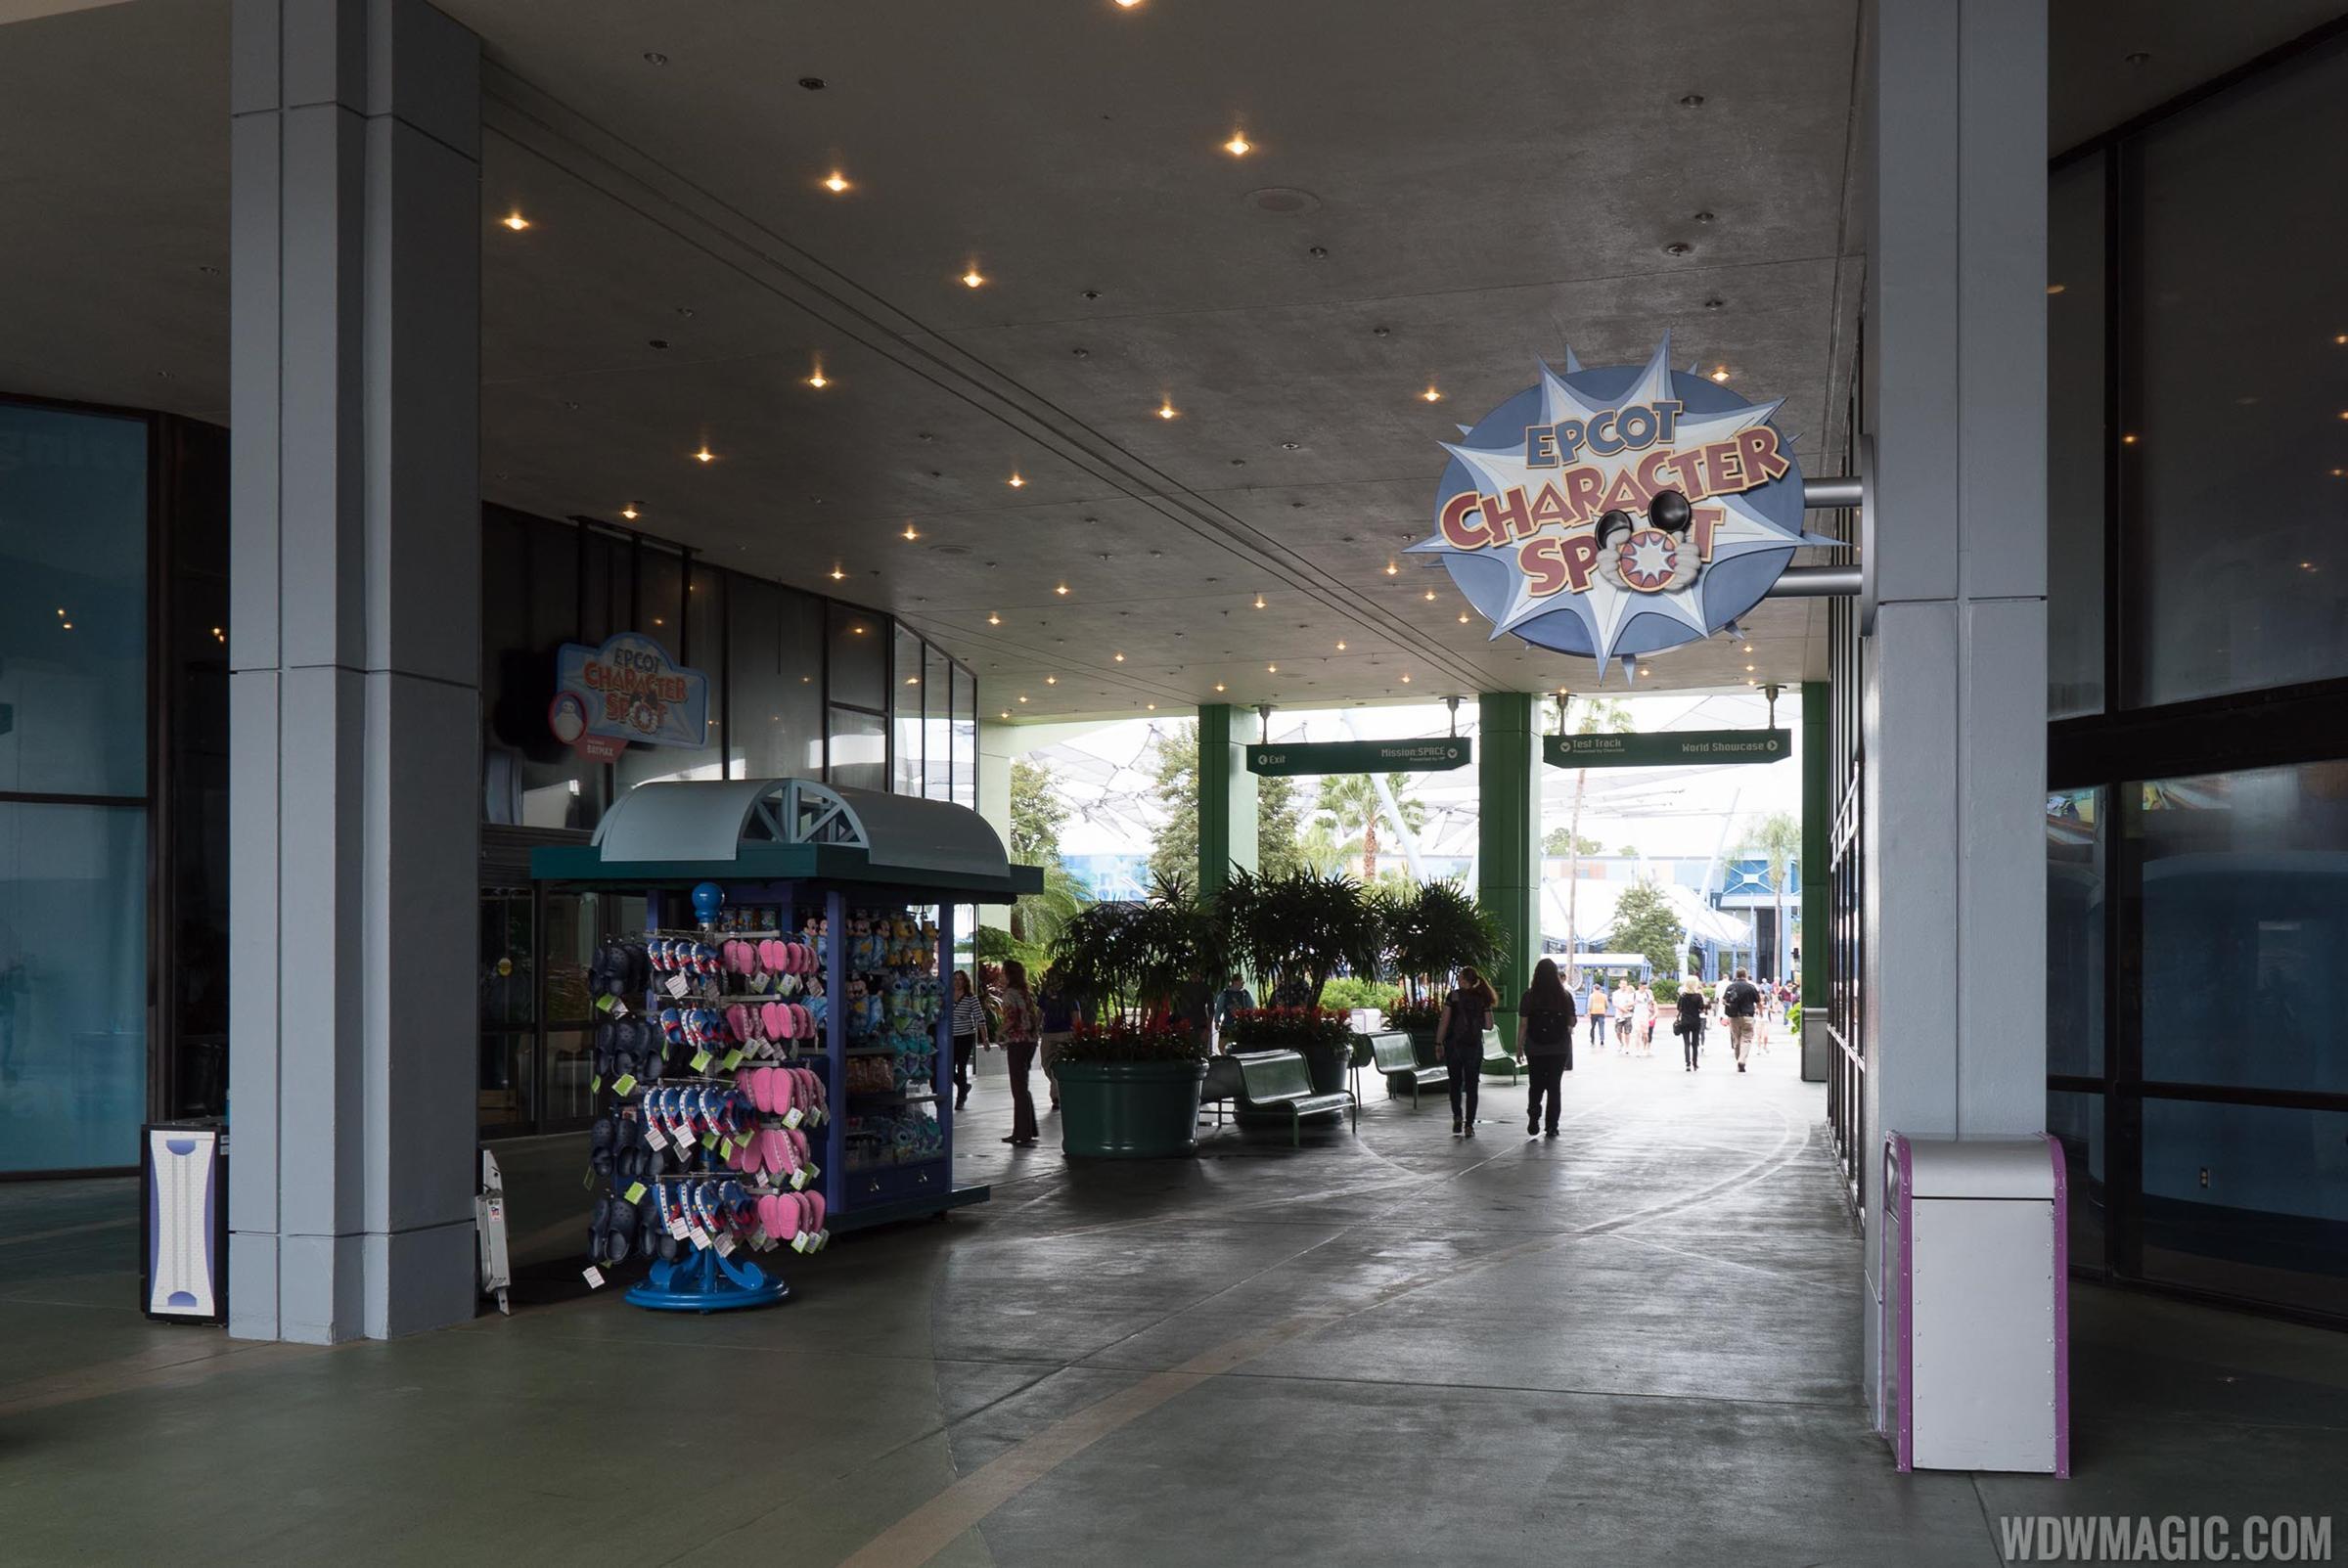 Disney visa character meet and greet moves location at epcot m4hsunfo